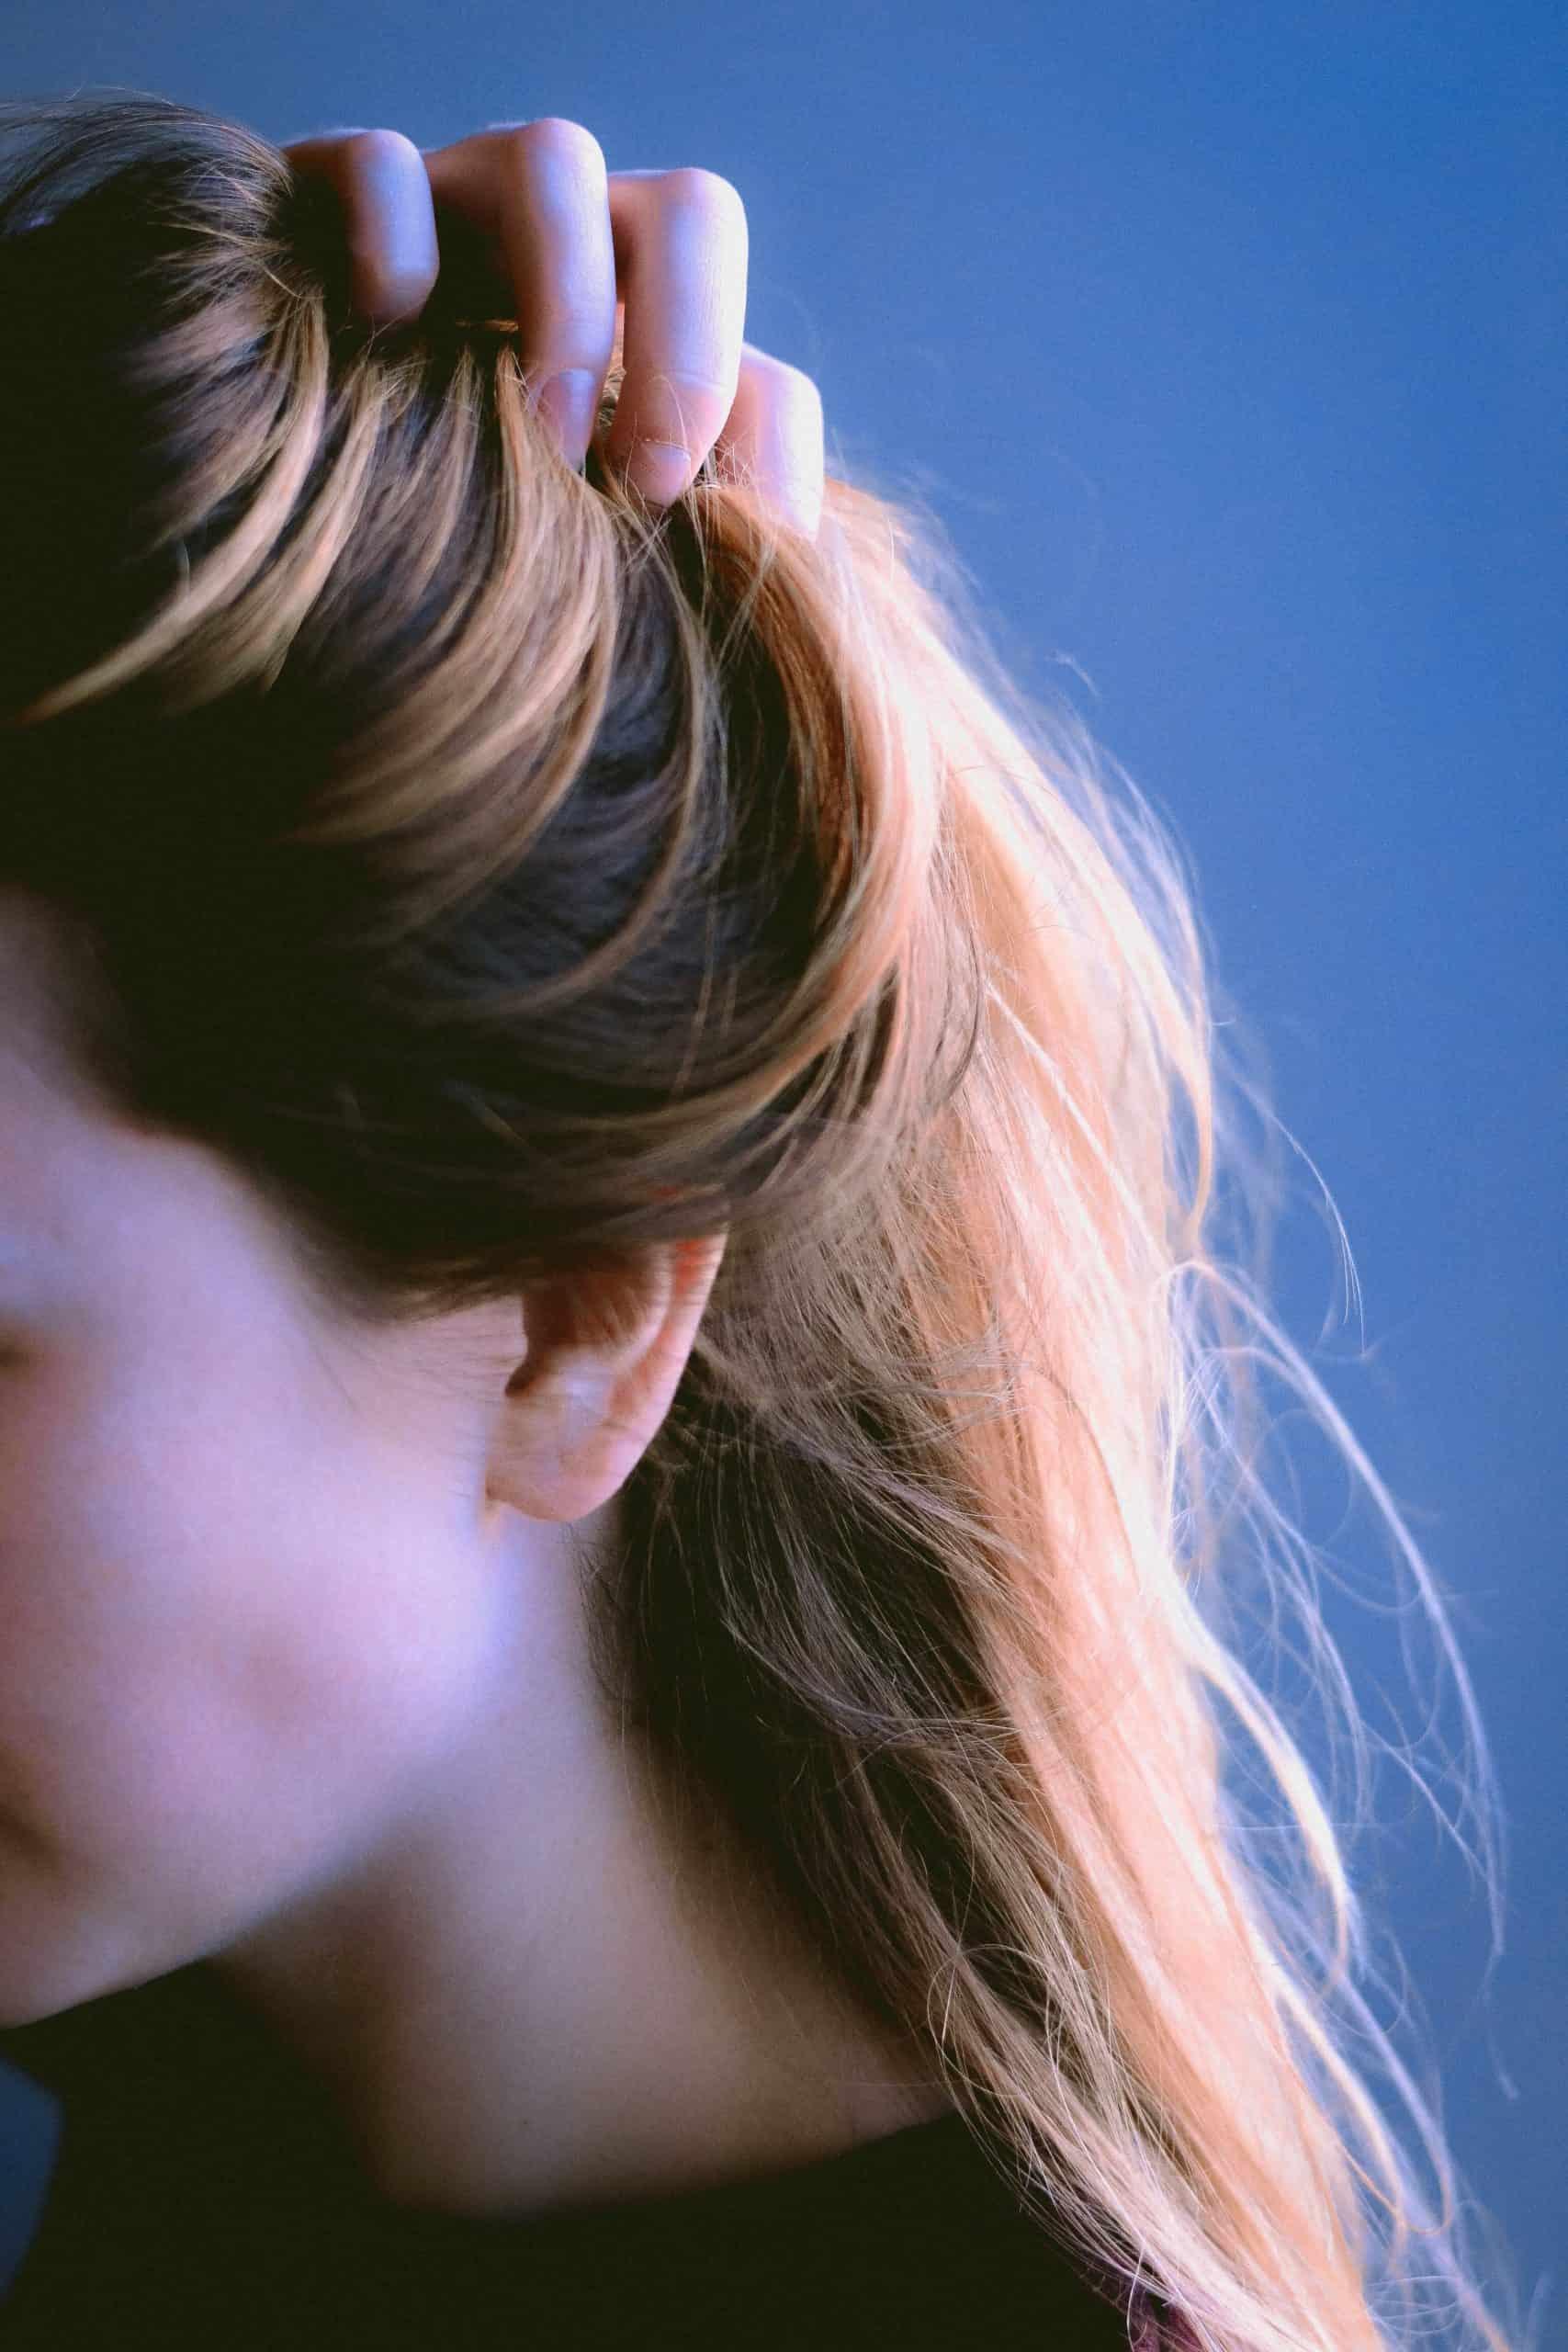 Woman close up lifting up her hair - IBS and hair loss